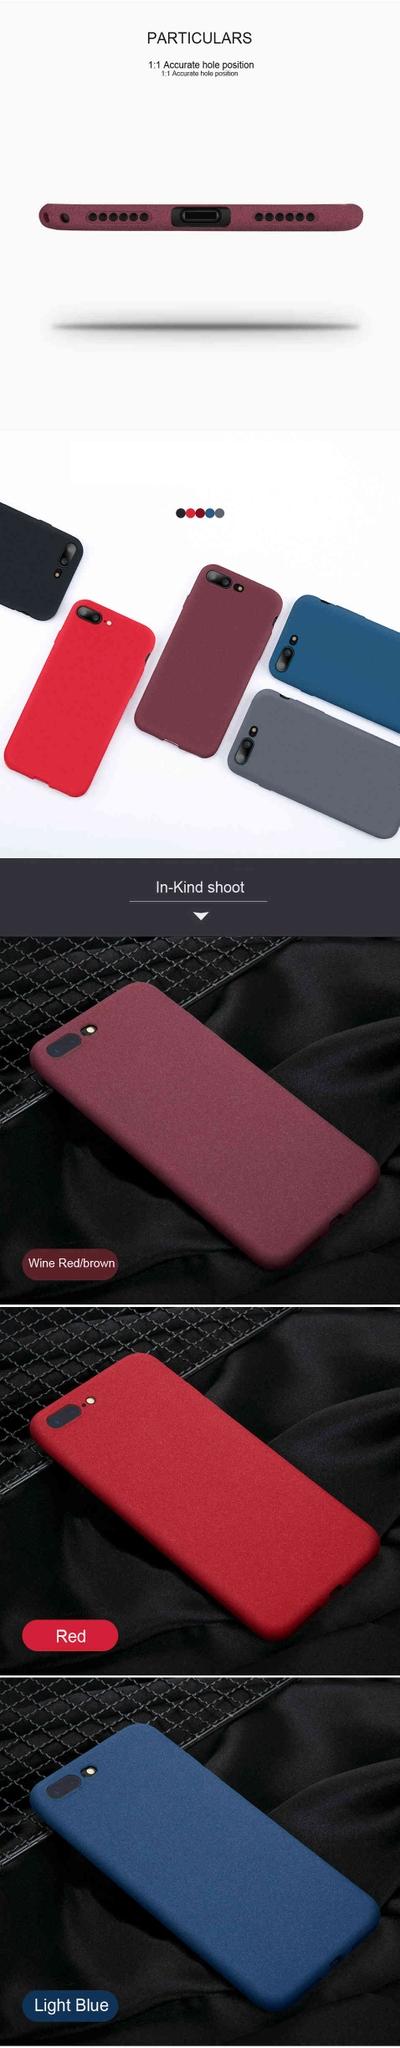 Silicone Soft TPU Matte Case for Huawei P20 P10 Lite P20 Pro P10 P9 P8 Lite 2017 P Smart Nova 2 Plus 2i 2s Case Cover Phone Bag (14)